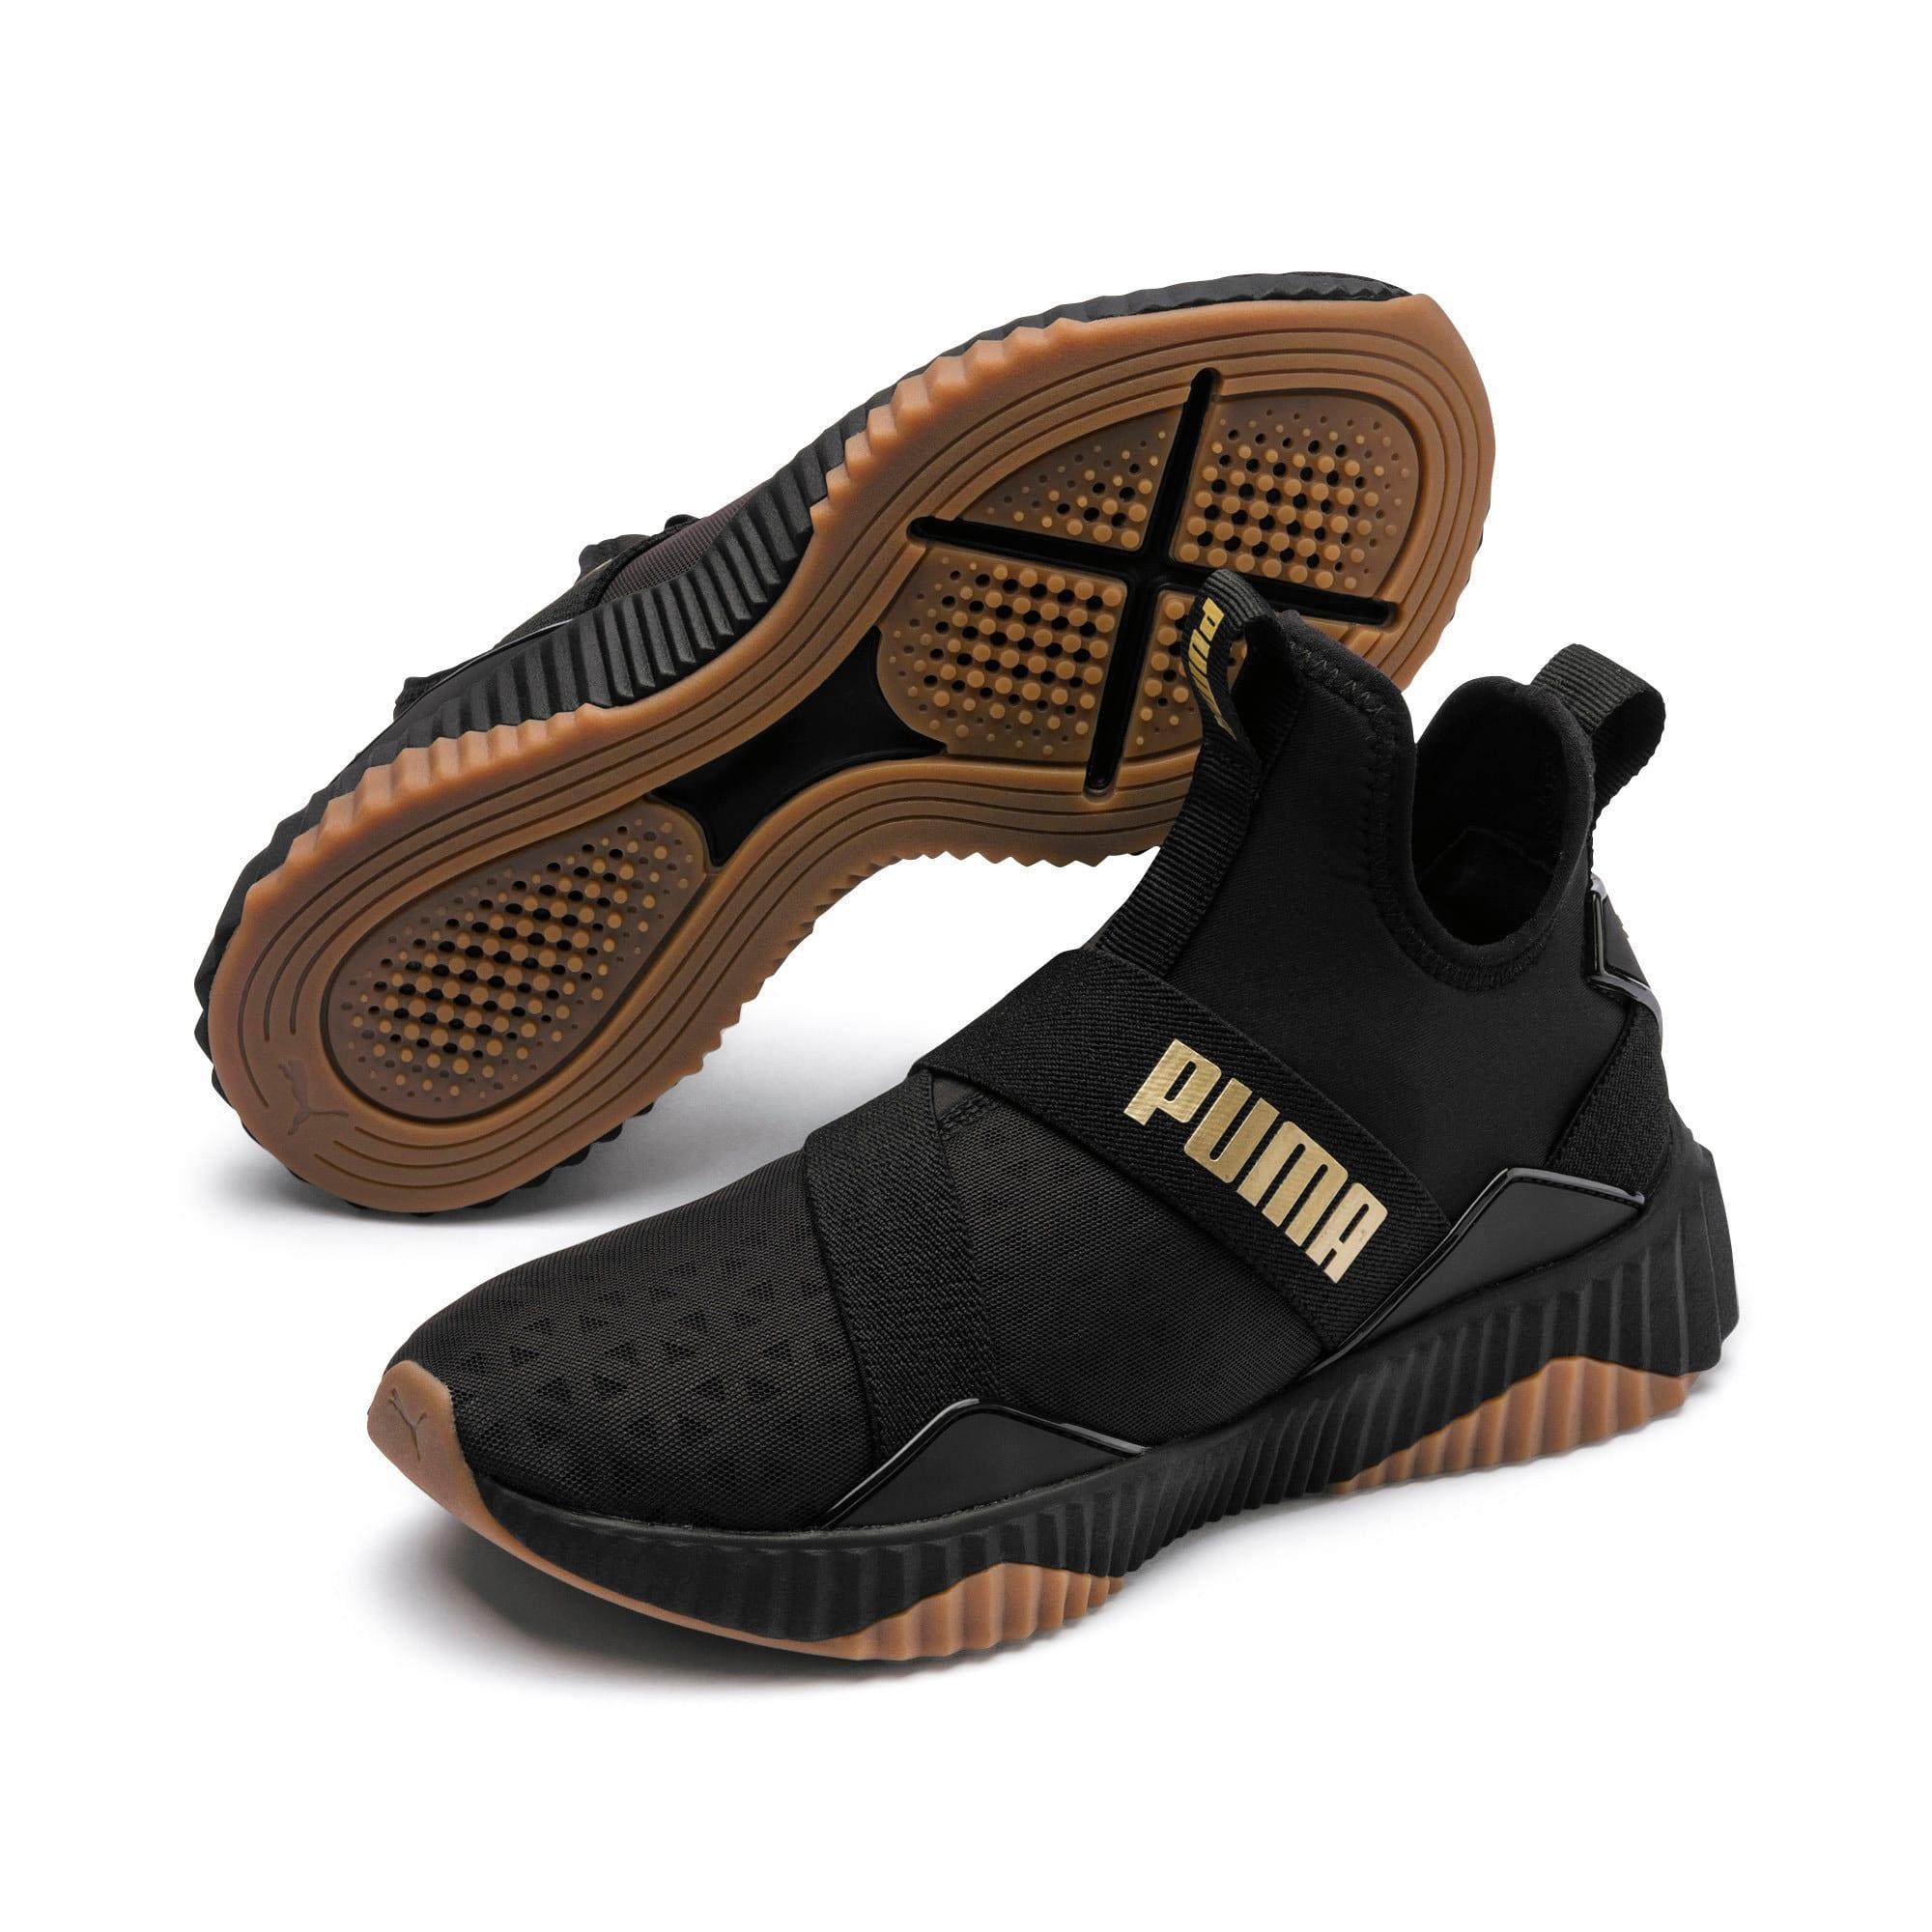 Thumbnail 3 of Defy Mid Sparkle Women's Training Shoes, Puma Black-Metallic Gold, medium